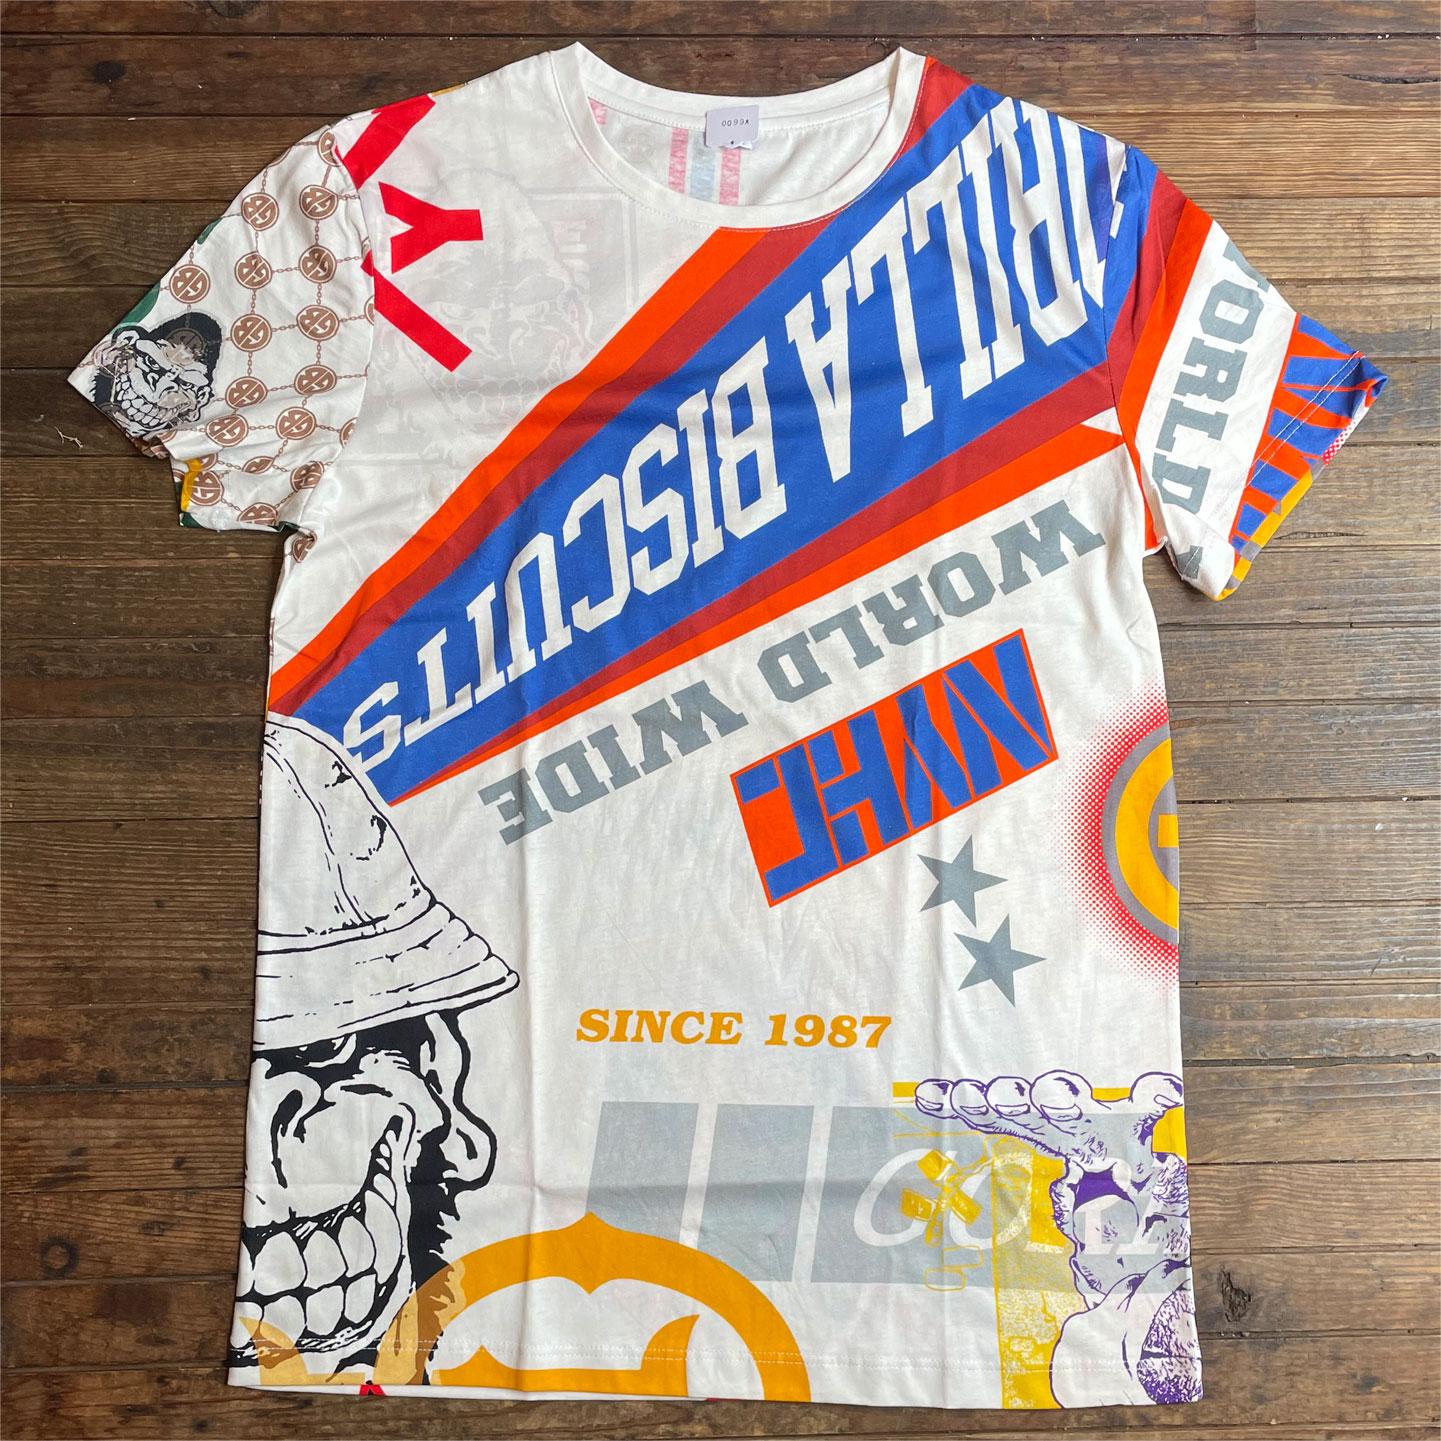 GORILLA BISCUITS Tシャツ ALL OVER PRINT Ltd!!!!